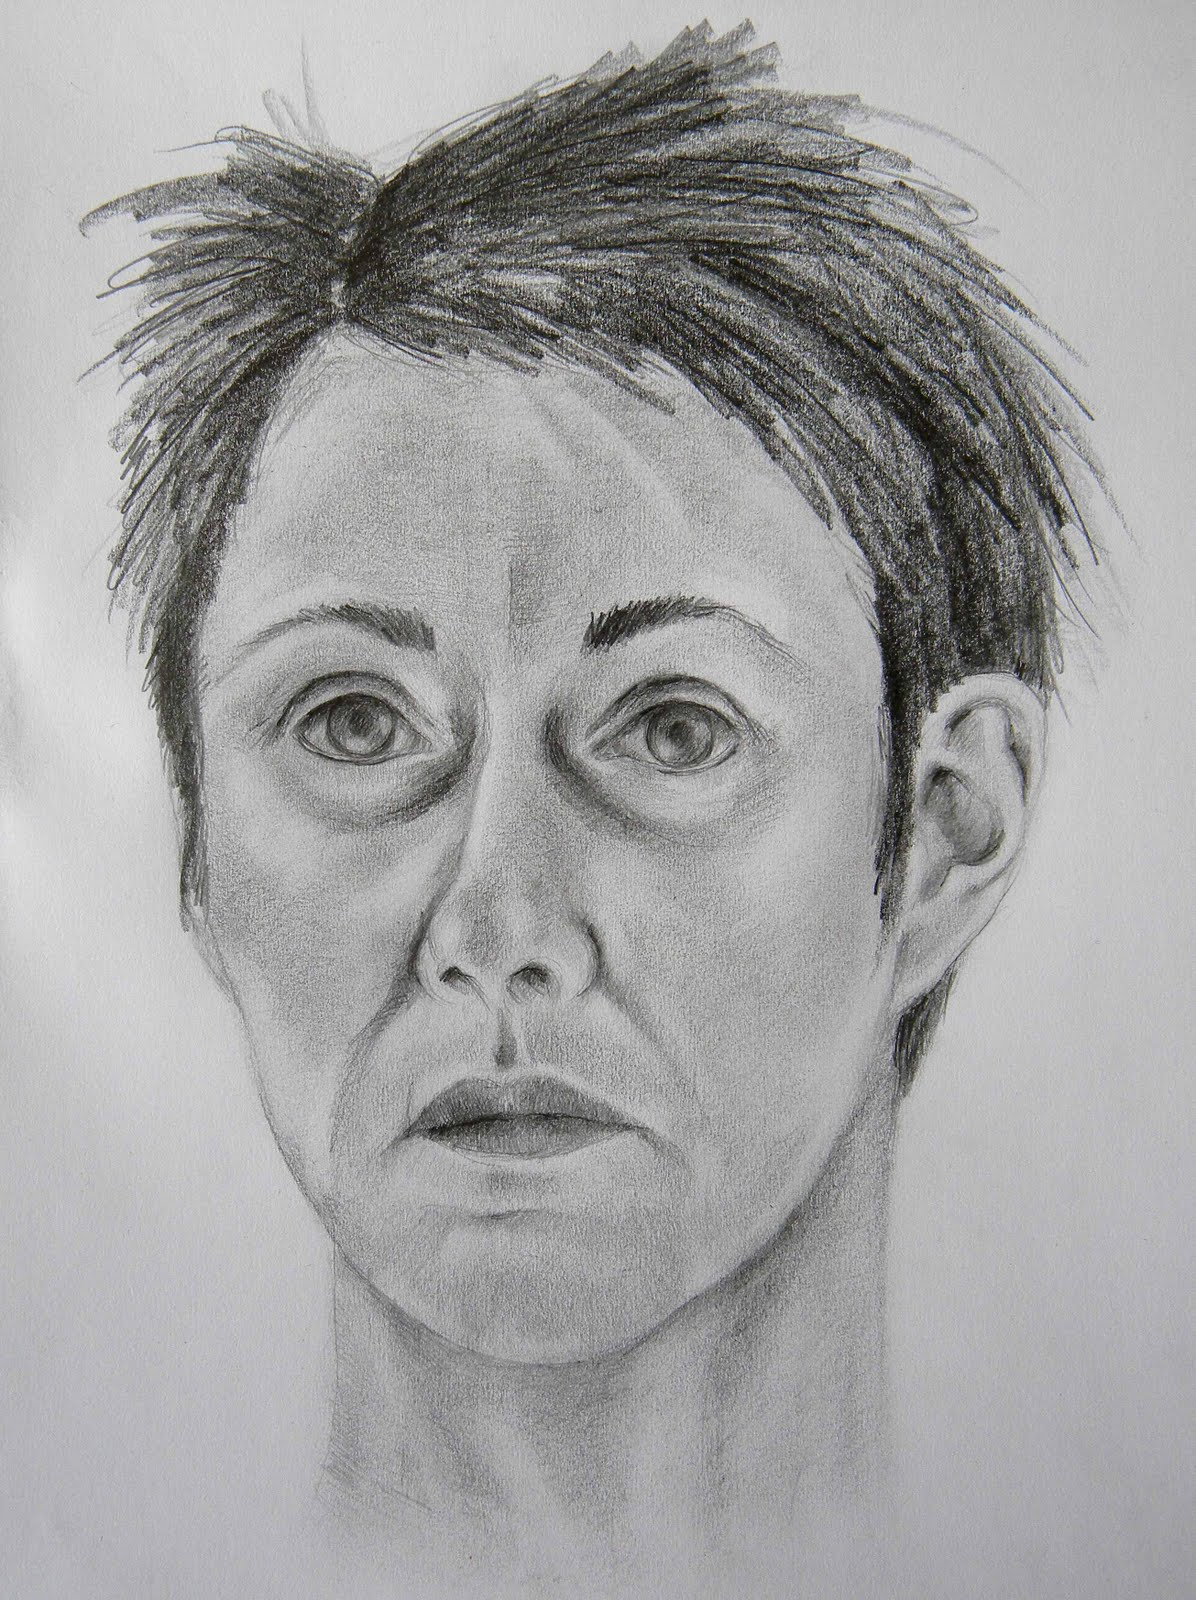 http://4.bp.blogspot.com/-mCMQPMICtxs/TXQJwaqg61I/AAAAAAAACzs/zNyEdAjNlFI/s1600/ugly%2Bself%2Bportrait.jpg